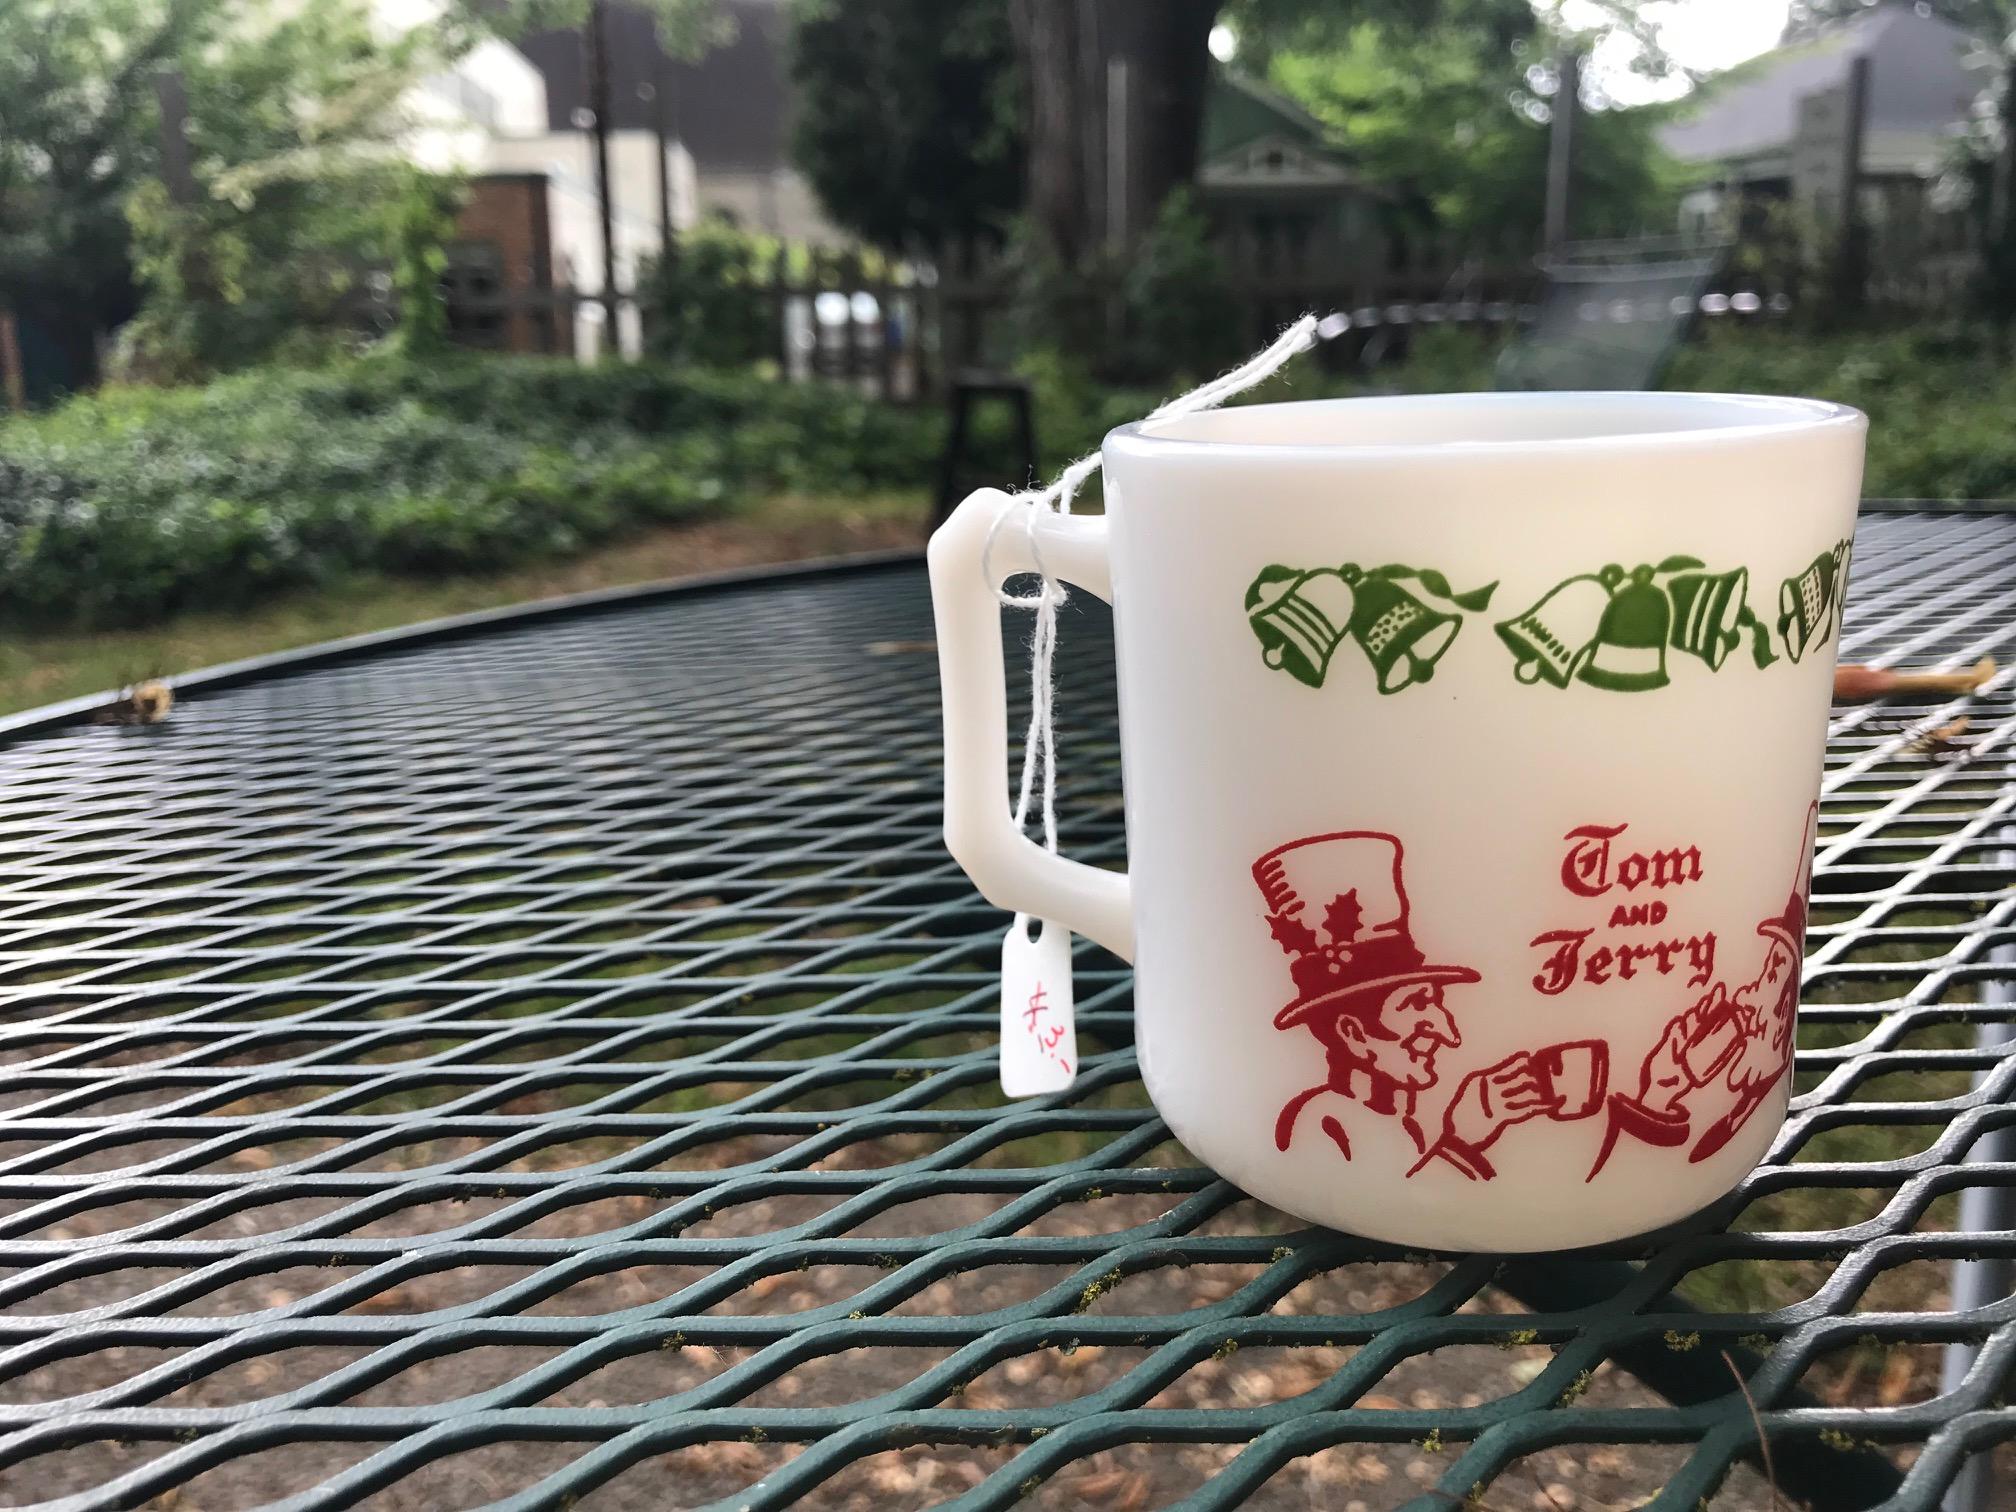 Tom And Jerry Vintage Milk Glass Christmas Mug: 37,100 ppm Lead + Cadmium